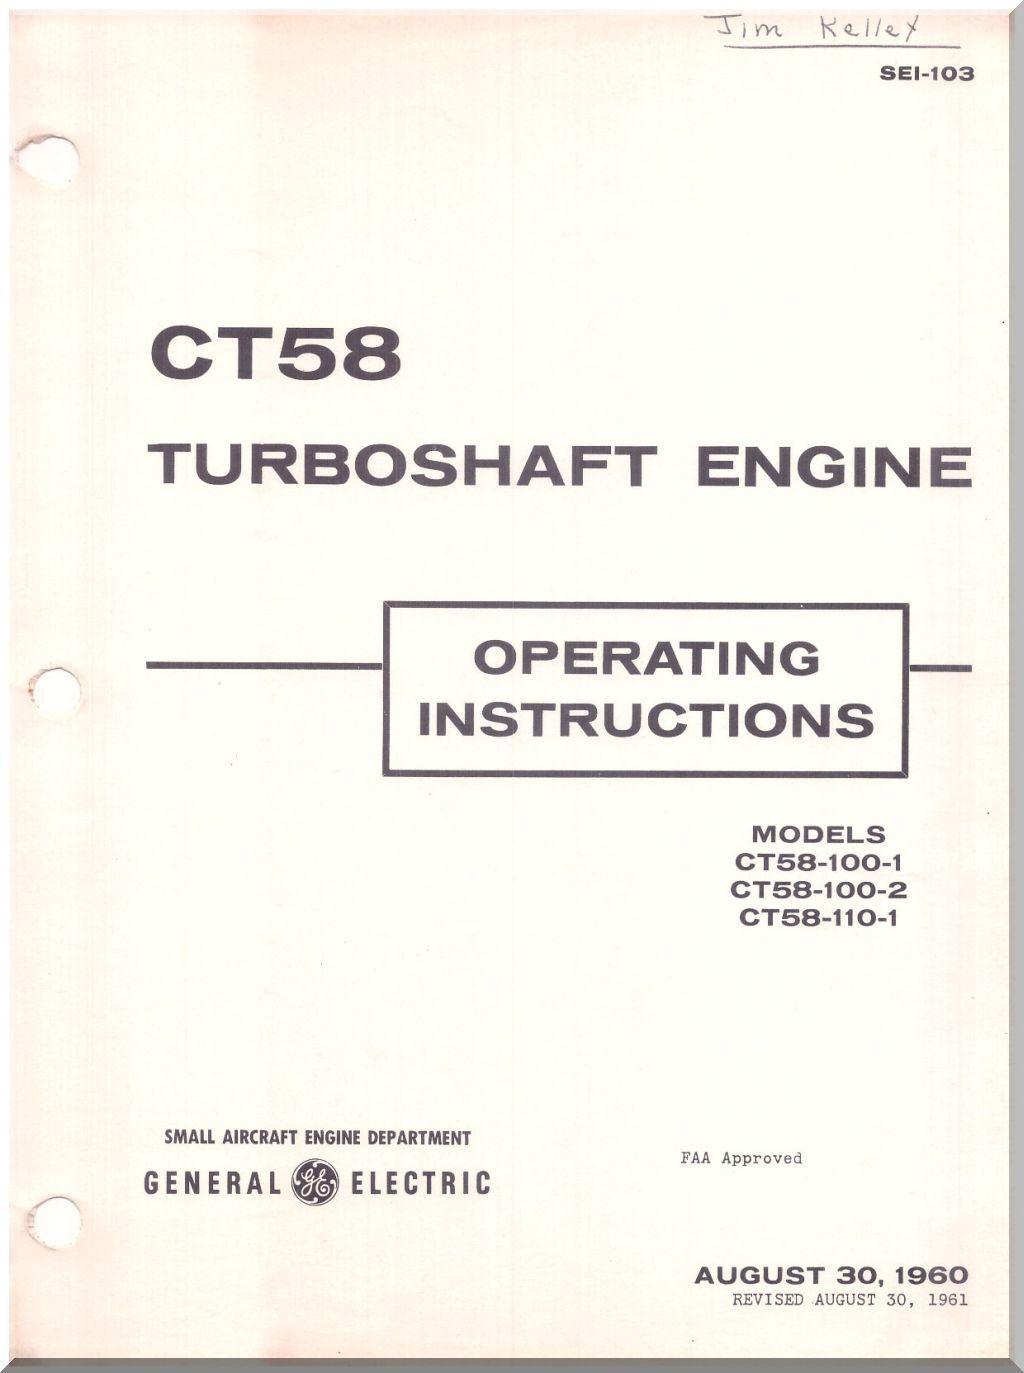 ge ct 58 aircraft engine operating instruction manual sei 103 1960 3 rh pinterest com general electric dishwasher user manual general electric microwave user manual